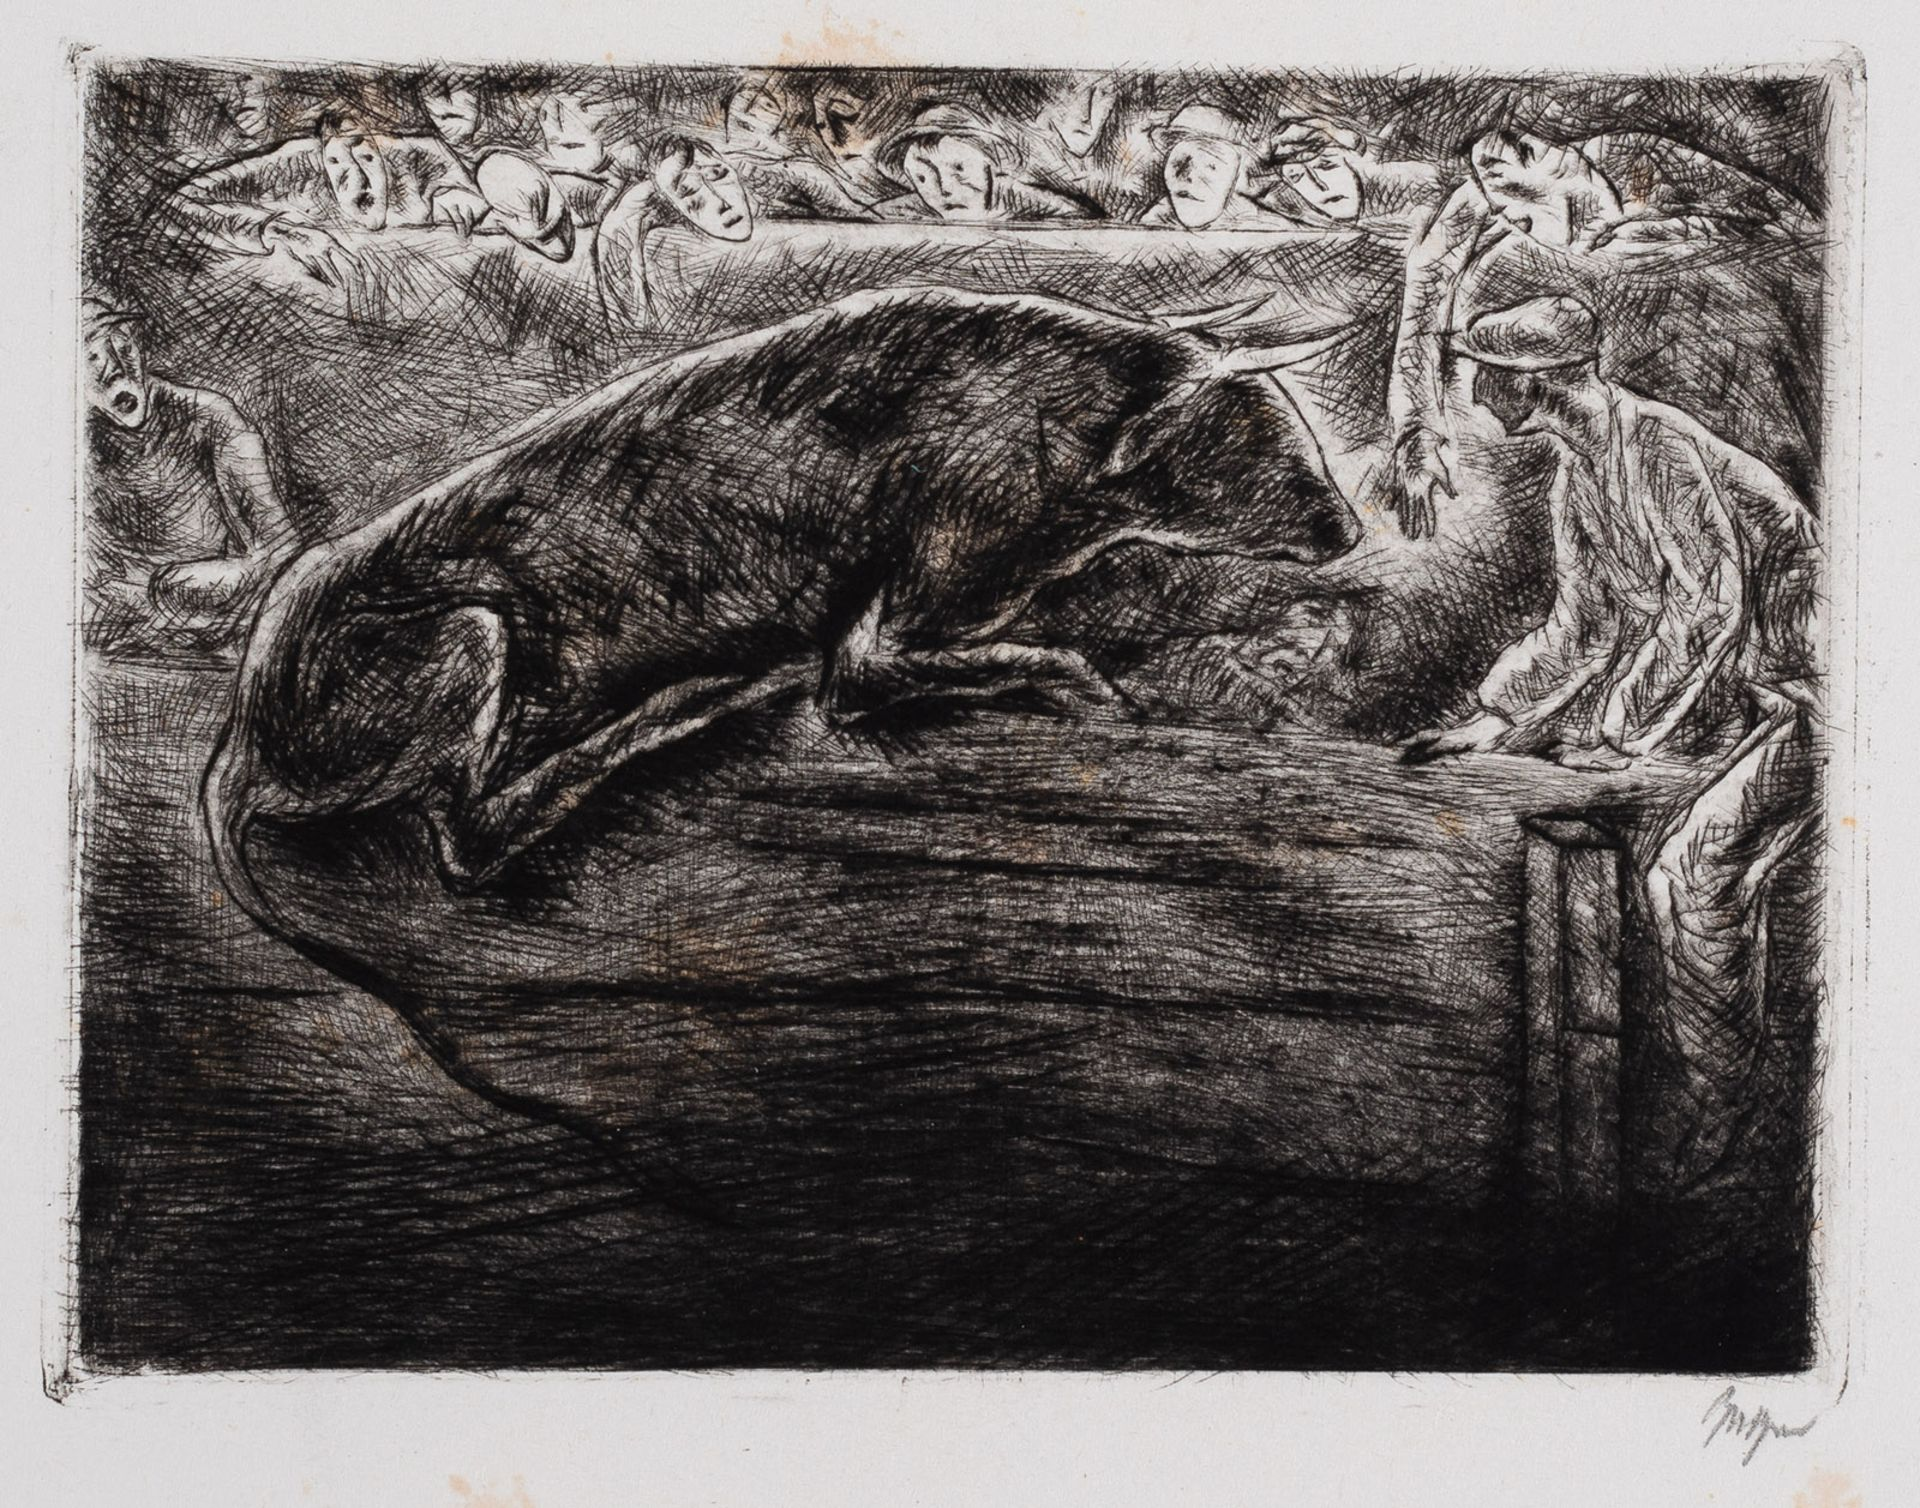 Geiger, Willi - Image 13 of 22